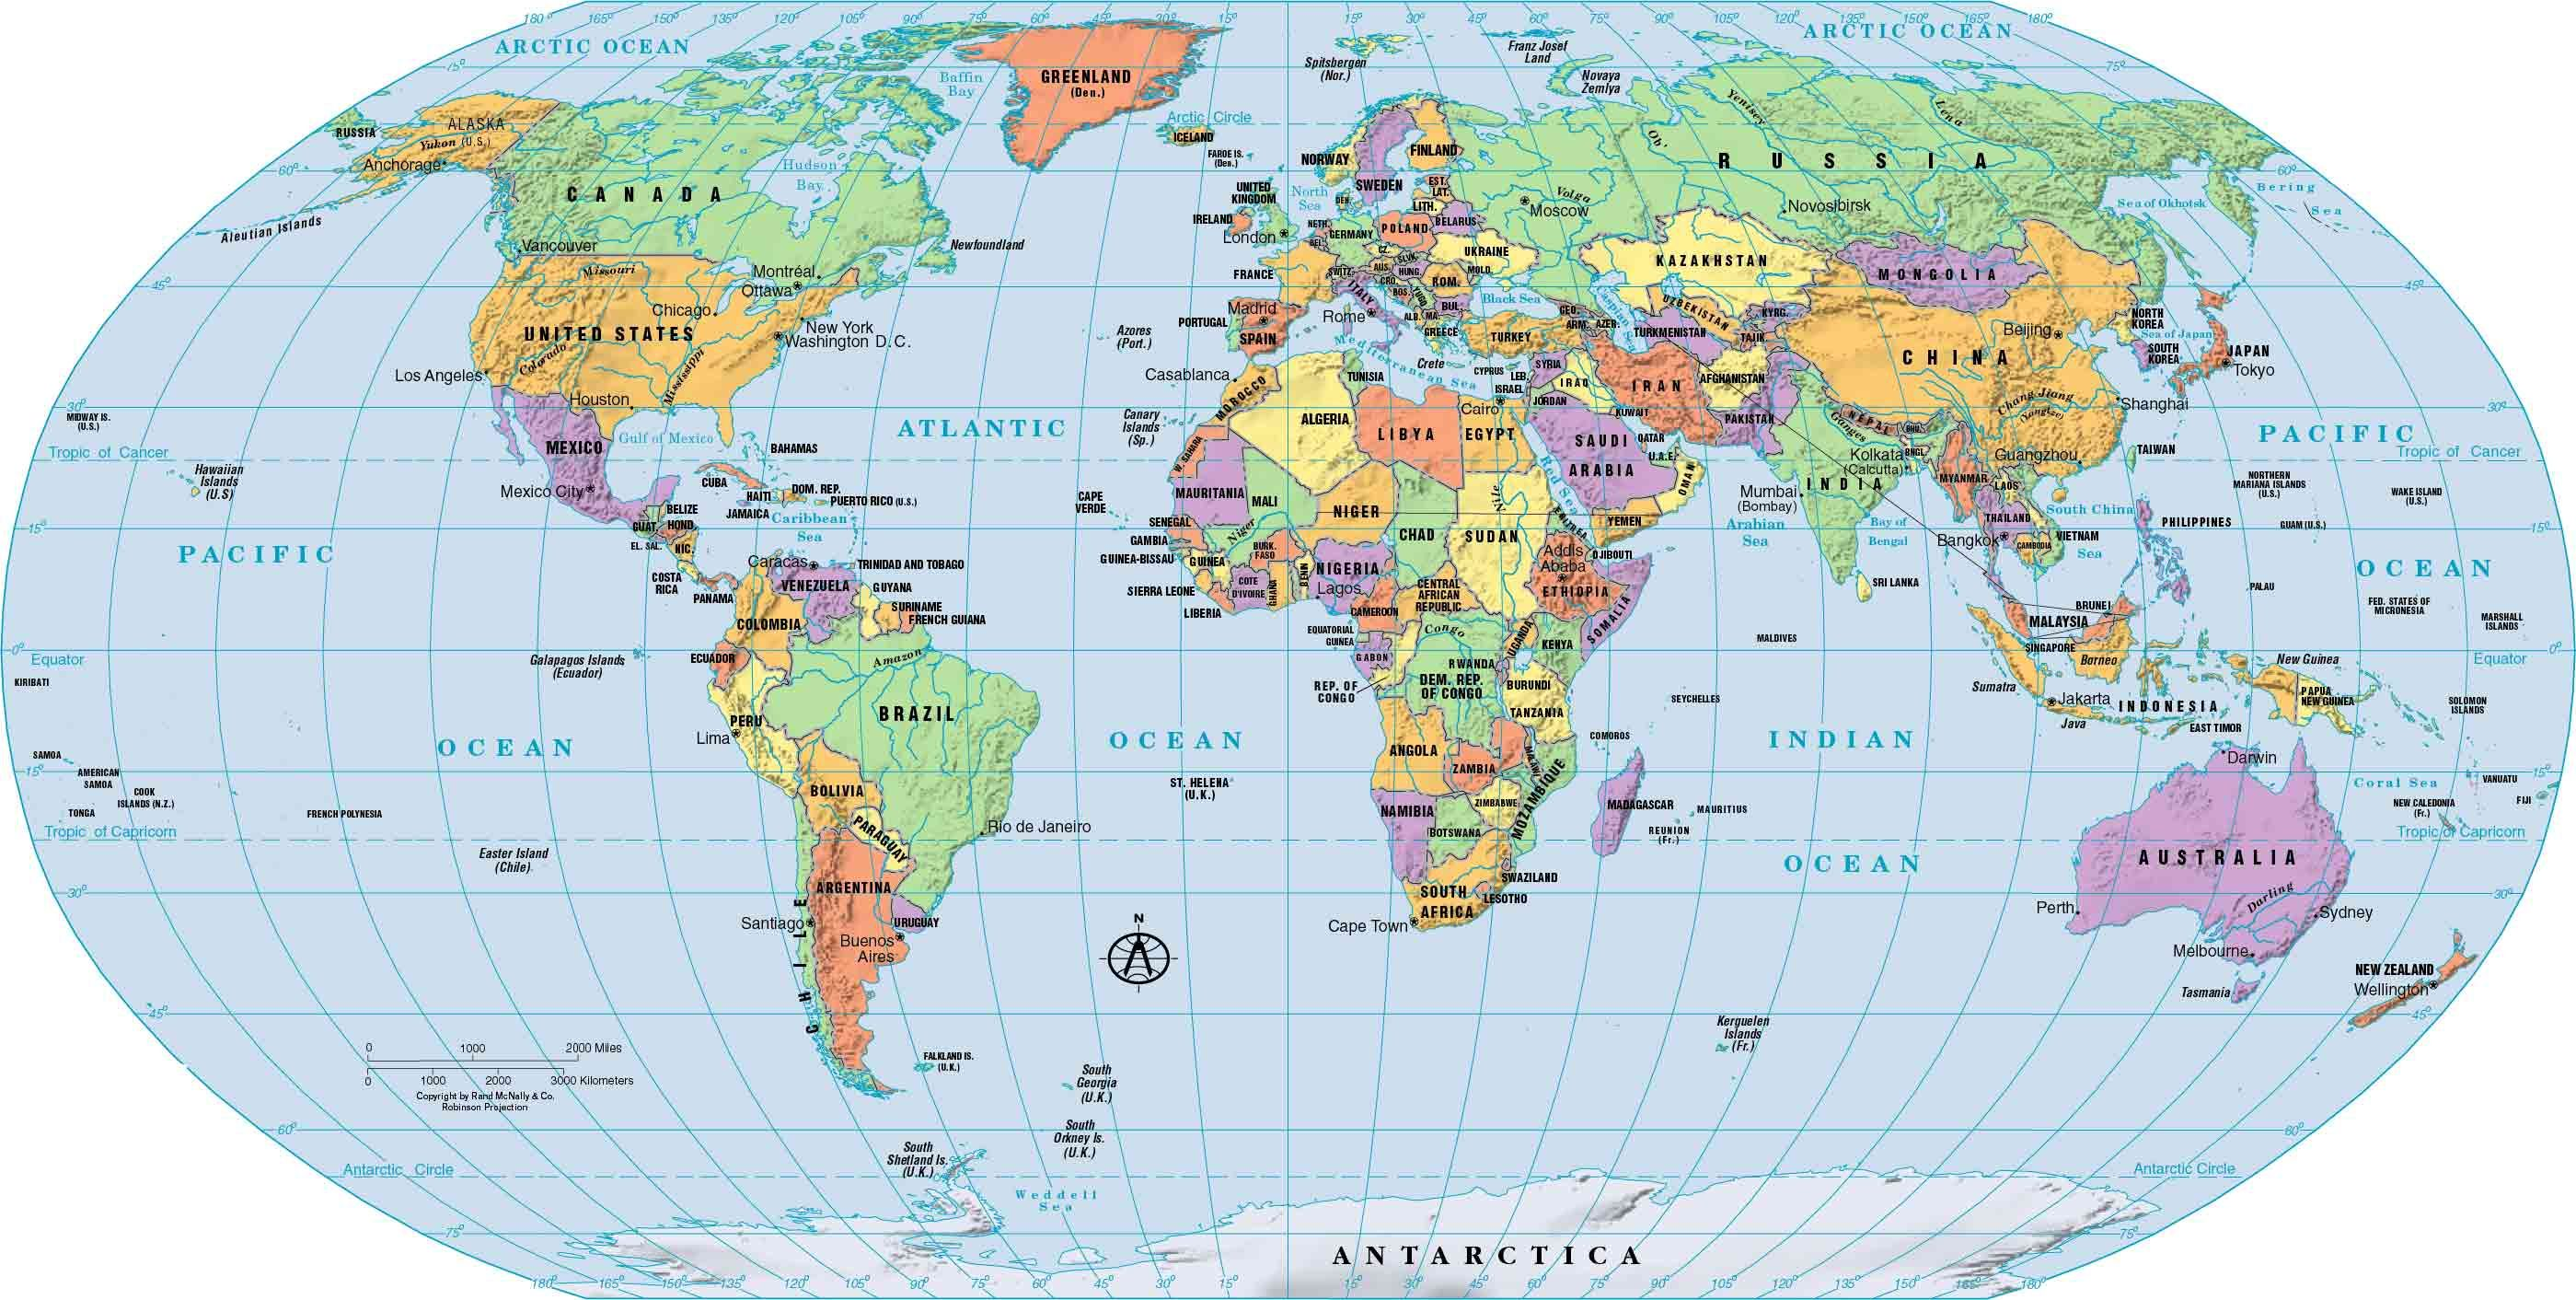 Mcd Wcg 0618168419 Pga2 F01 Jpg 2799 1412 Detailed World Map World Map Printable World Atlas Map